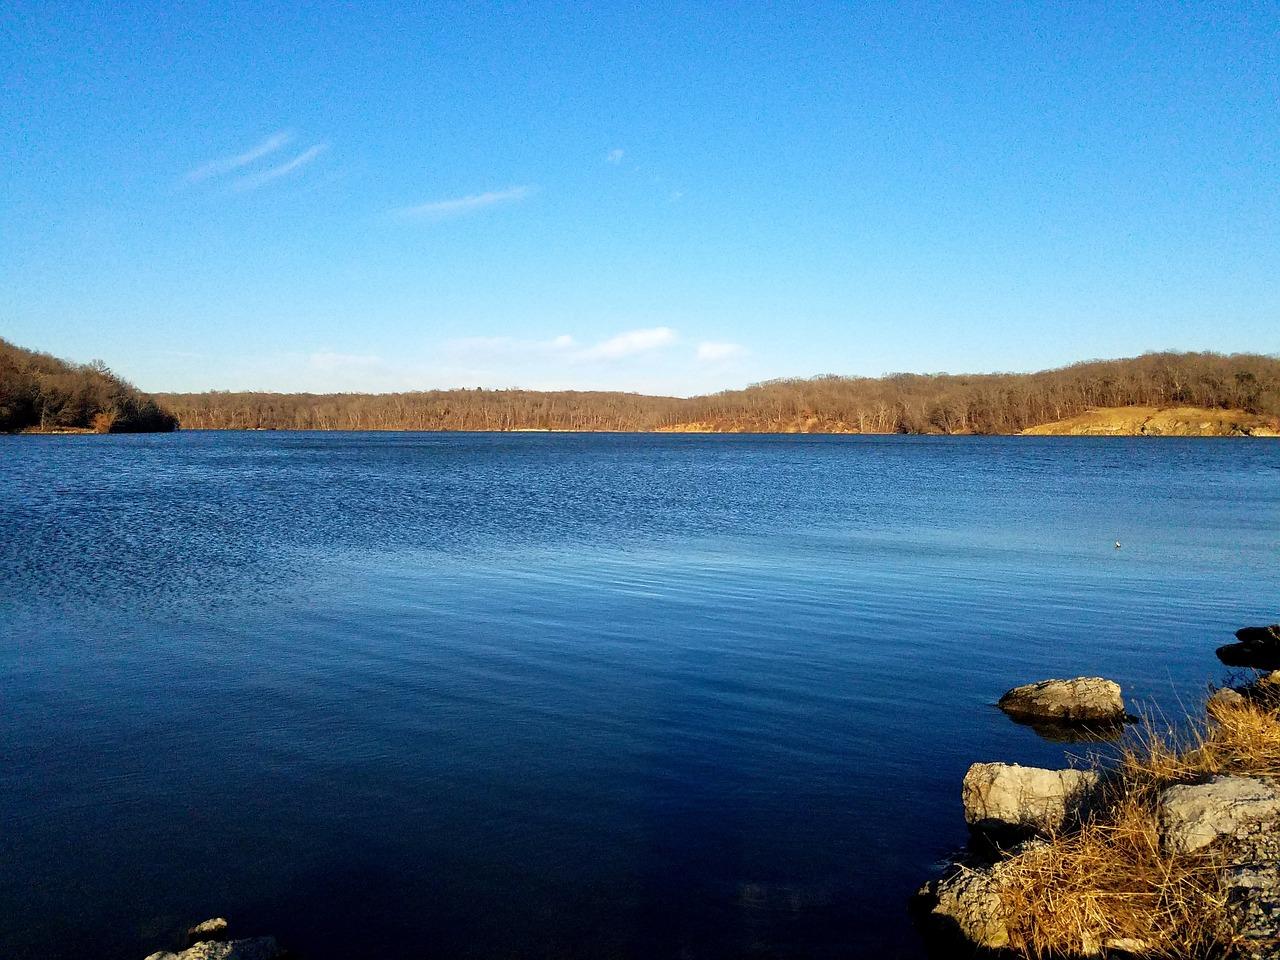 верхнеафипское озеро фото твёрдости-мягкости